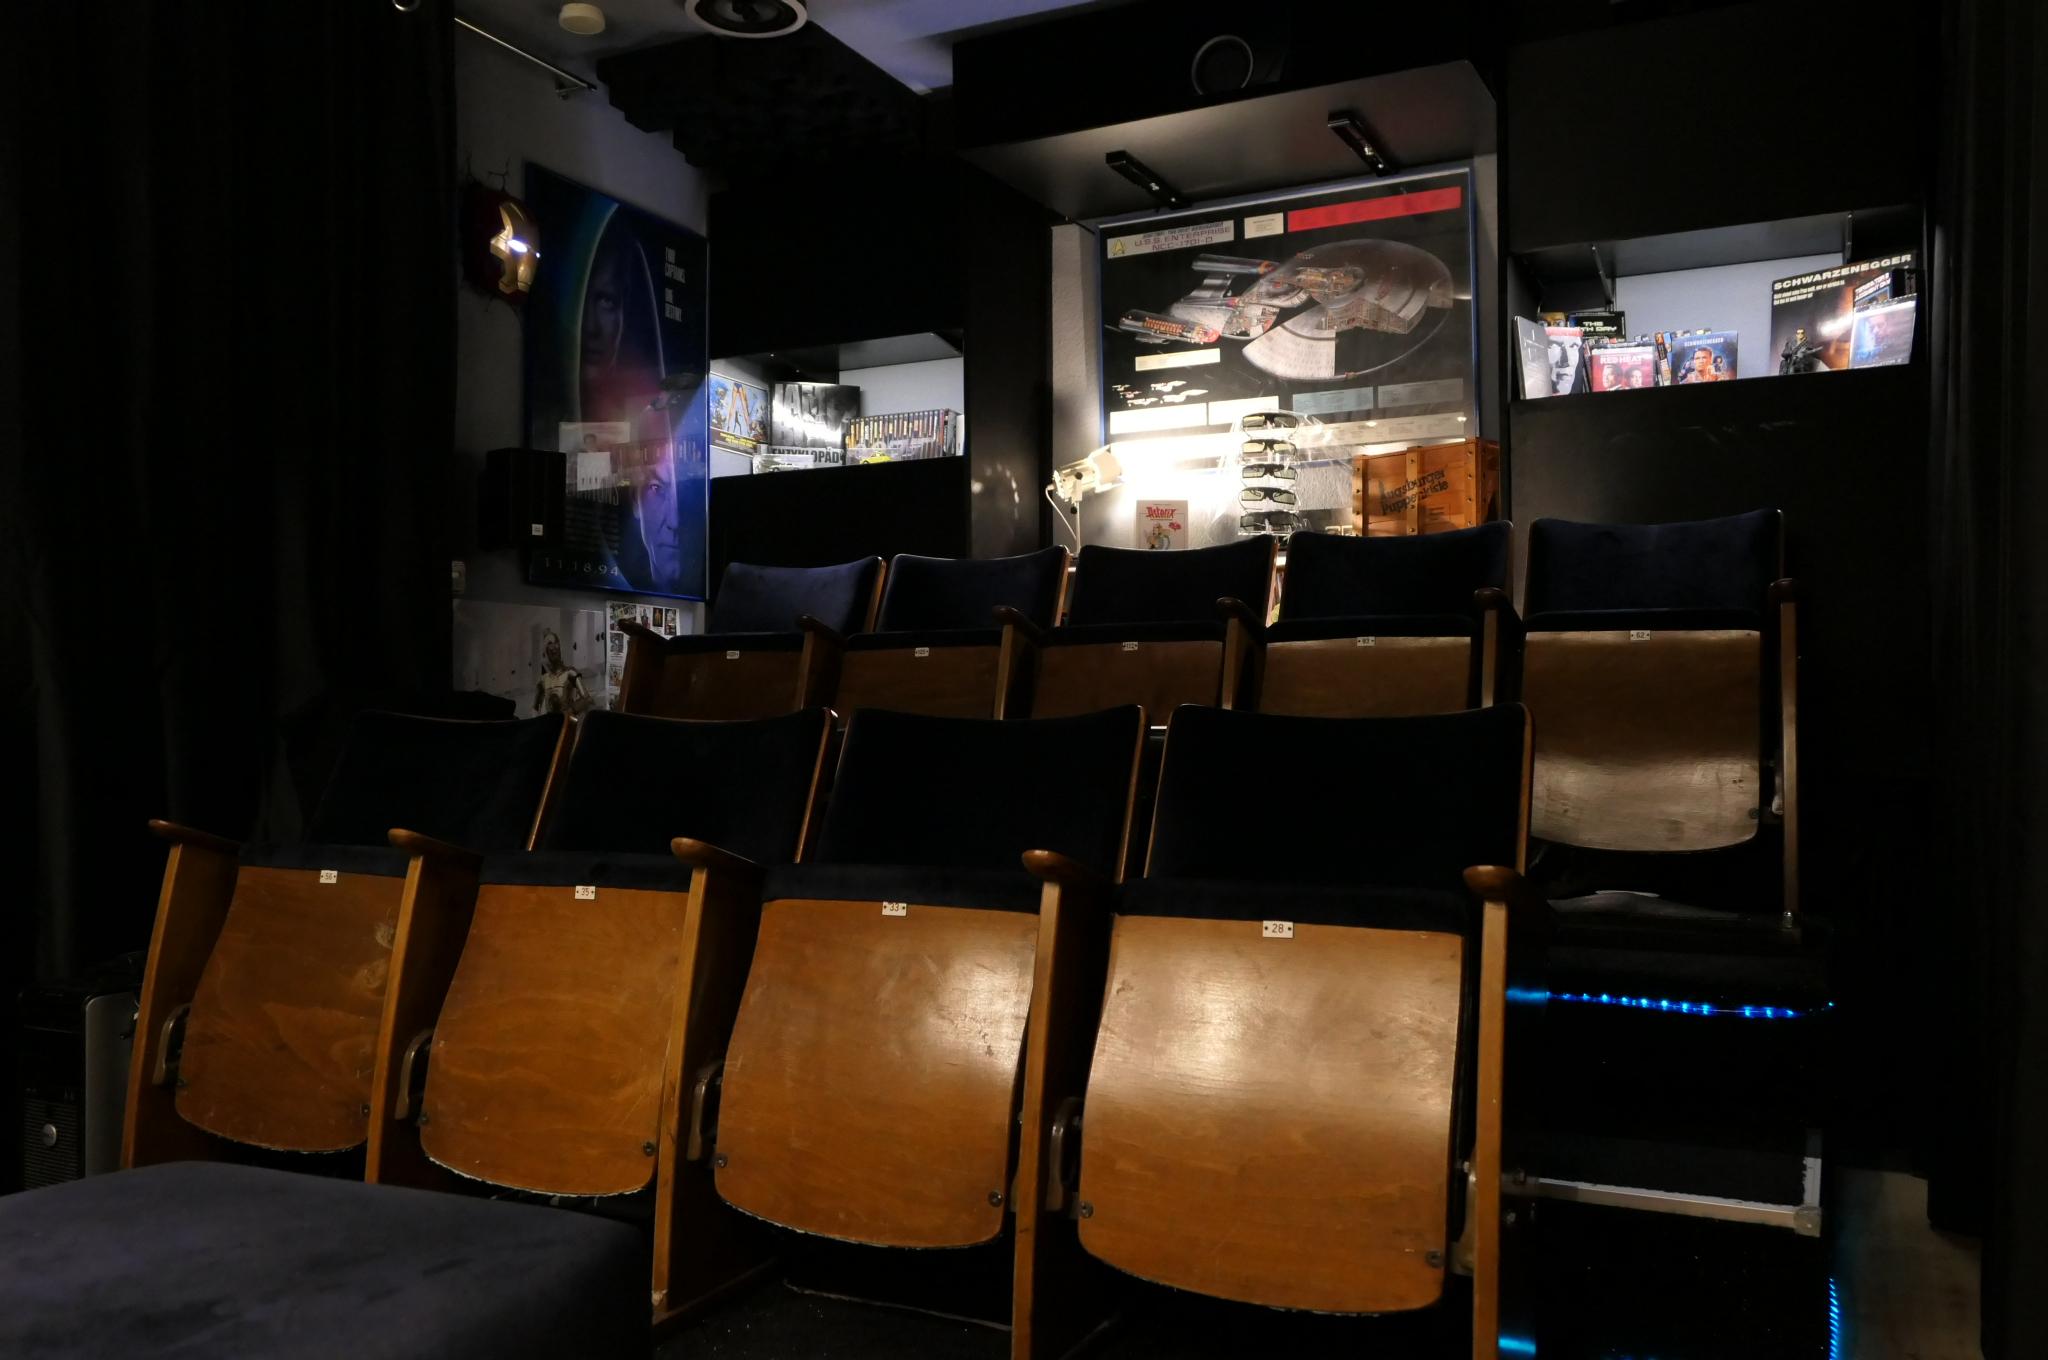 Sitze (Kino dunkel)